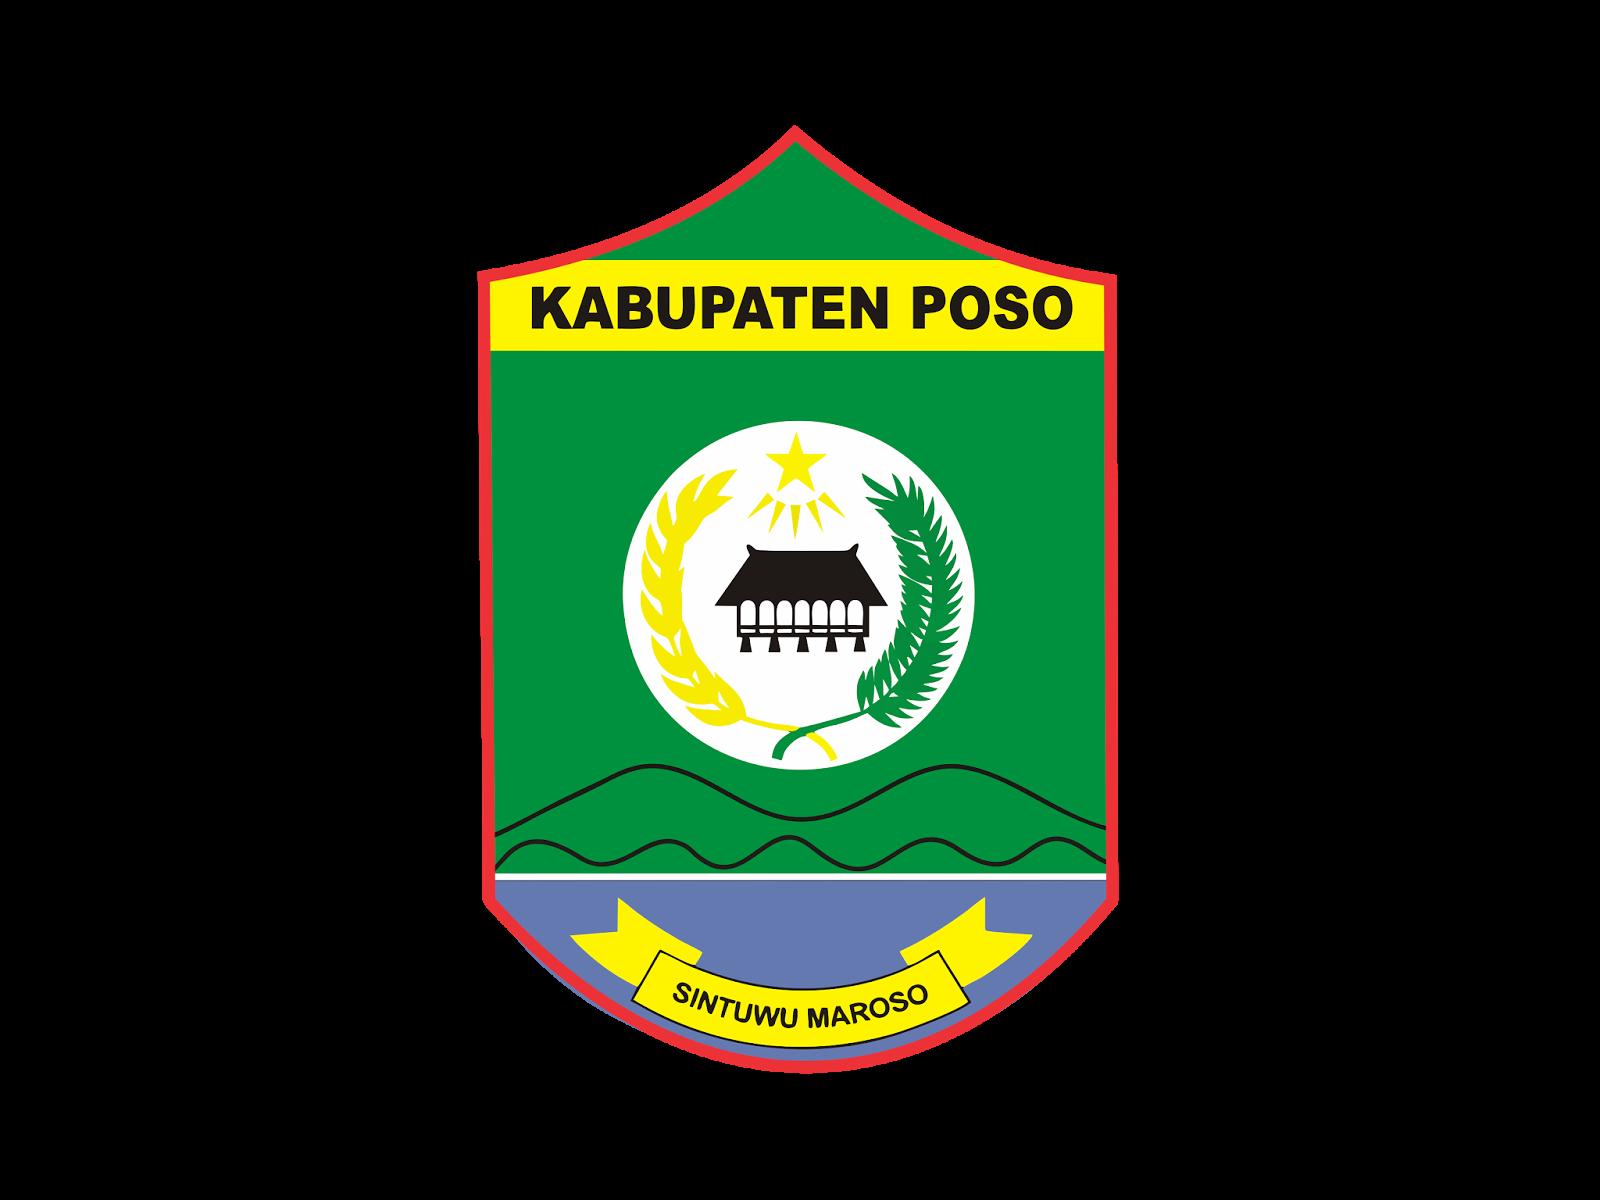 Logo Kabupaten Poso Vector Cdr Png Hd Biologizone